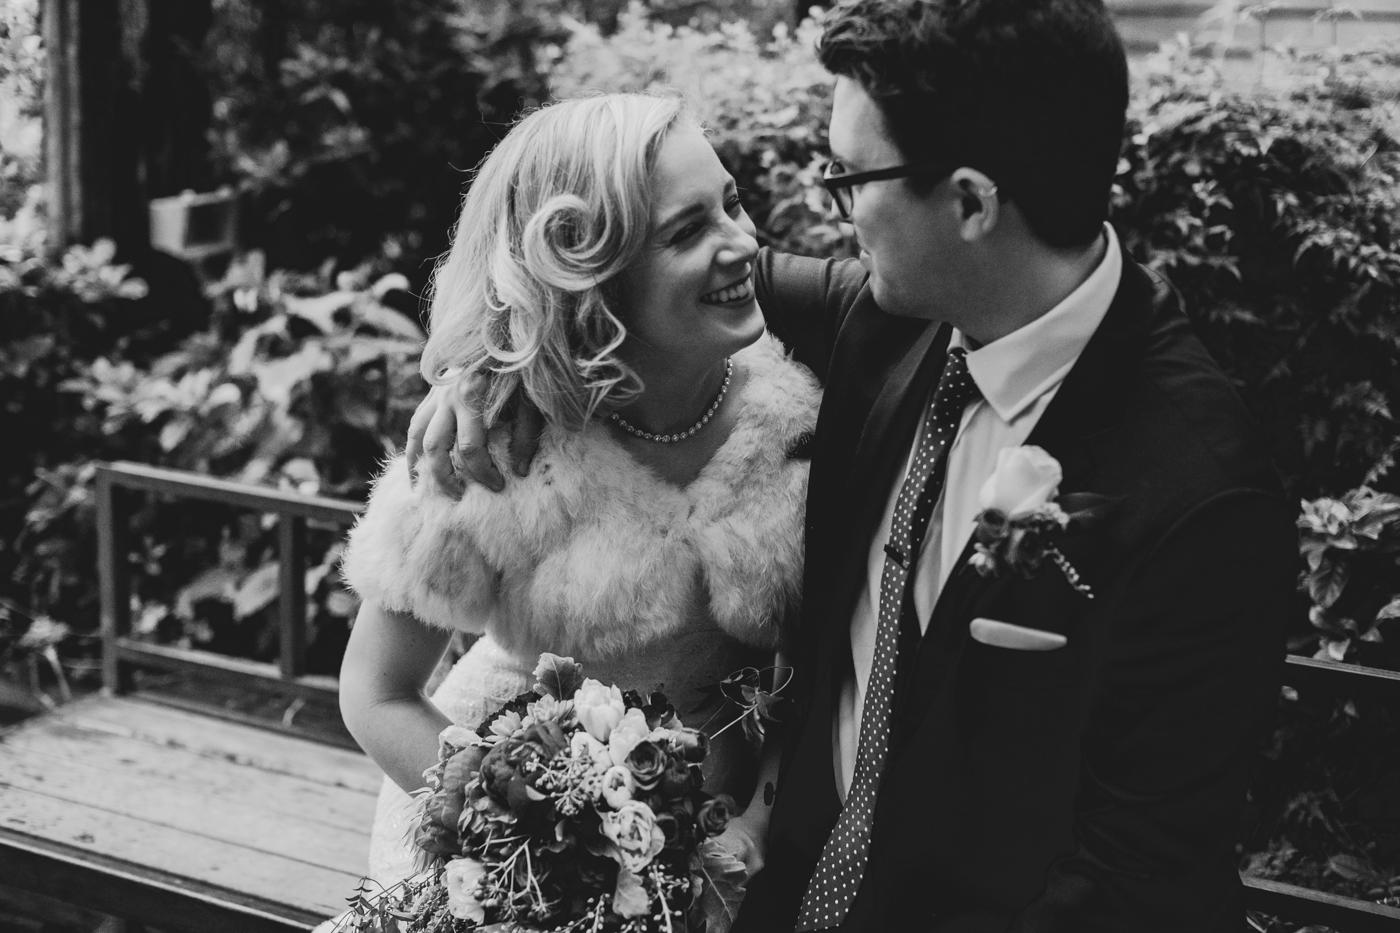 Jo & Tom Wedding - The Grounds of Alexandria - Samantha Heather Photography-236.jpg